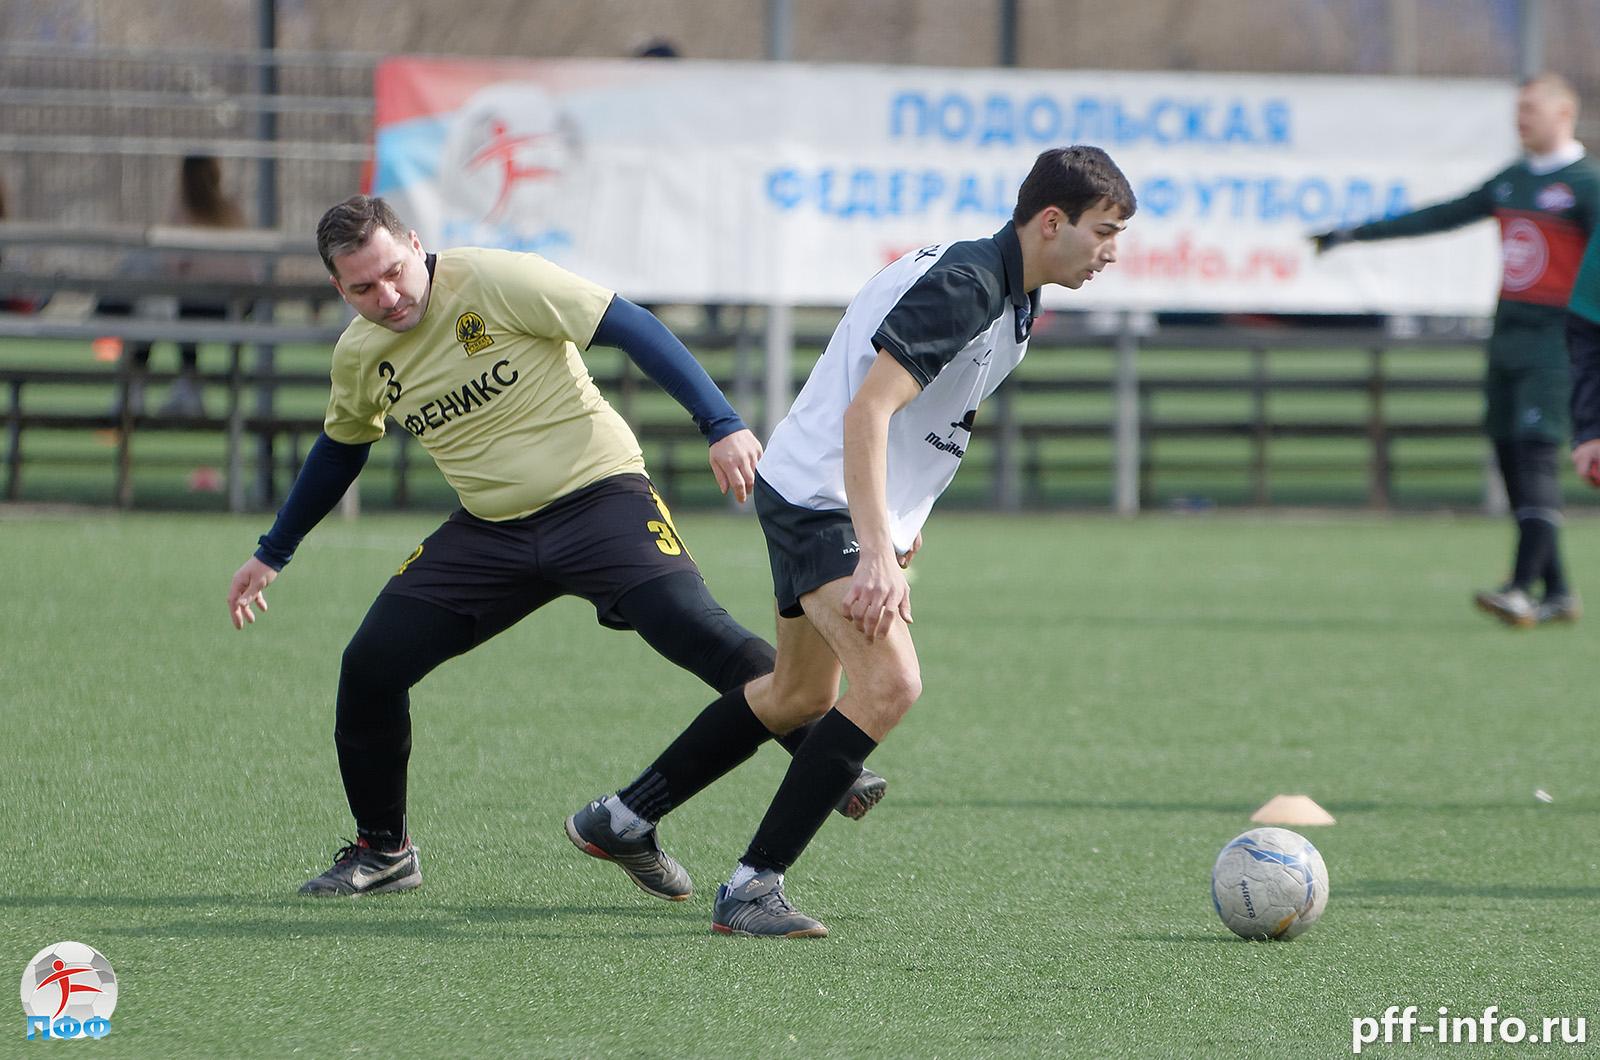 Премьер-лига ТДК. Обзор 2 тура